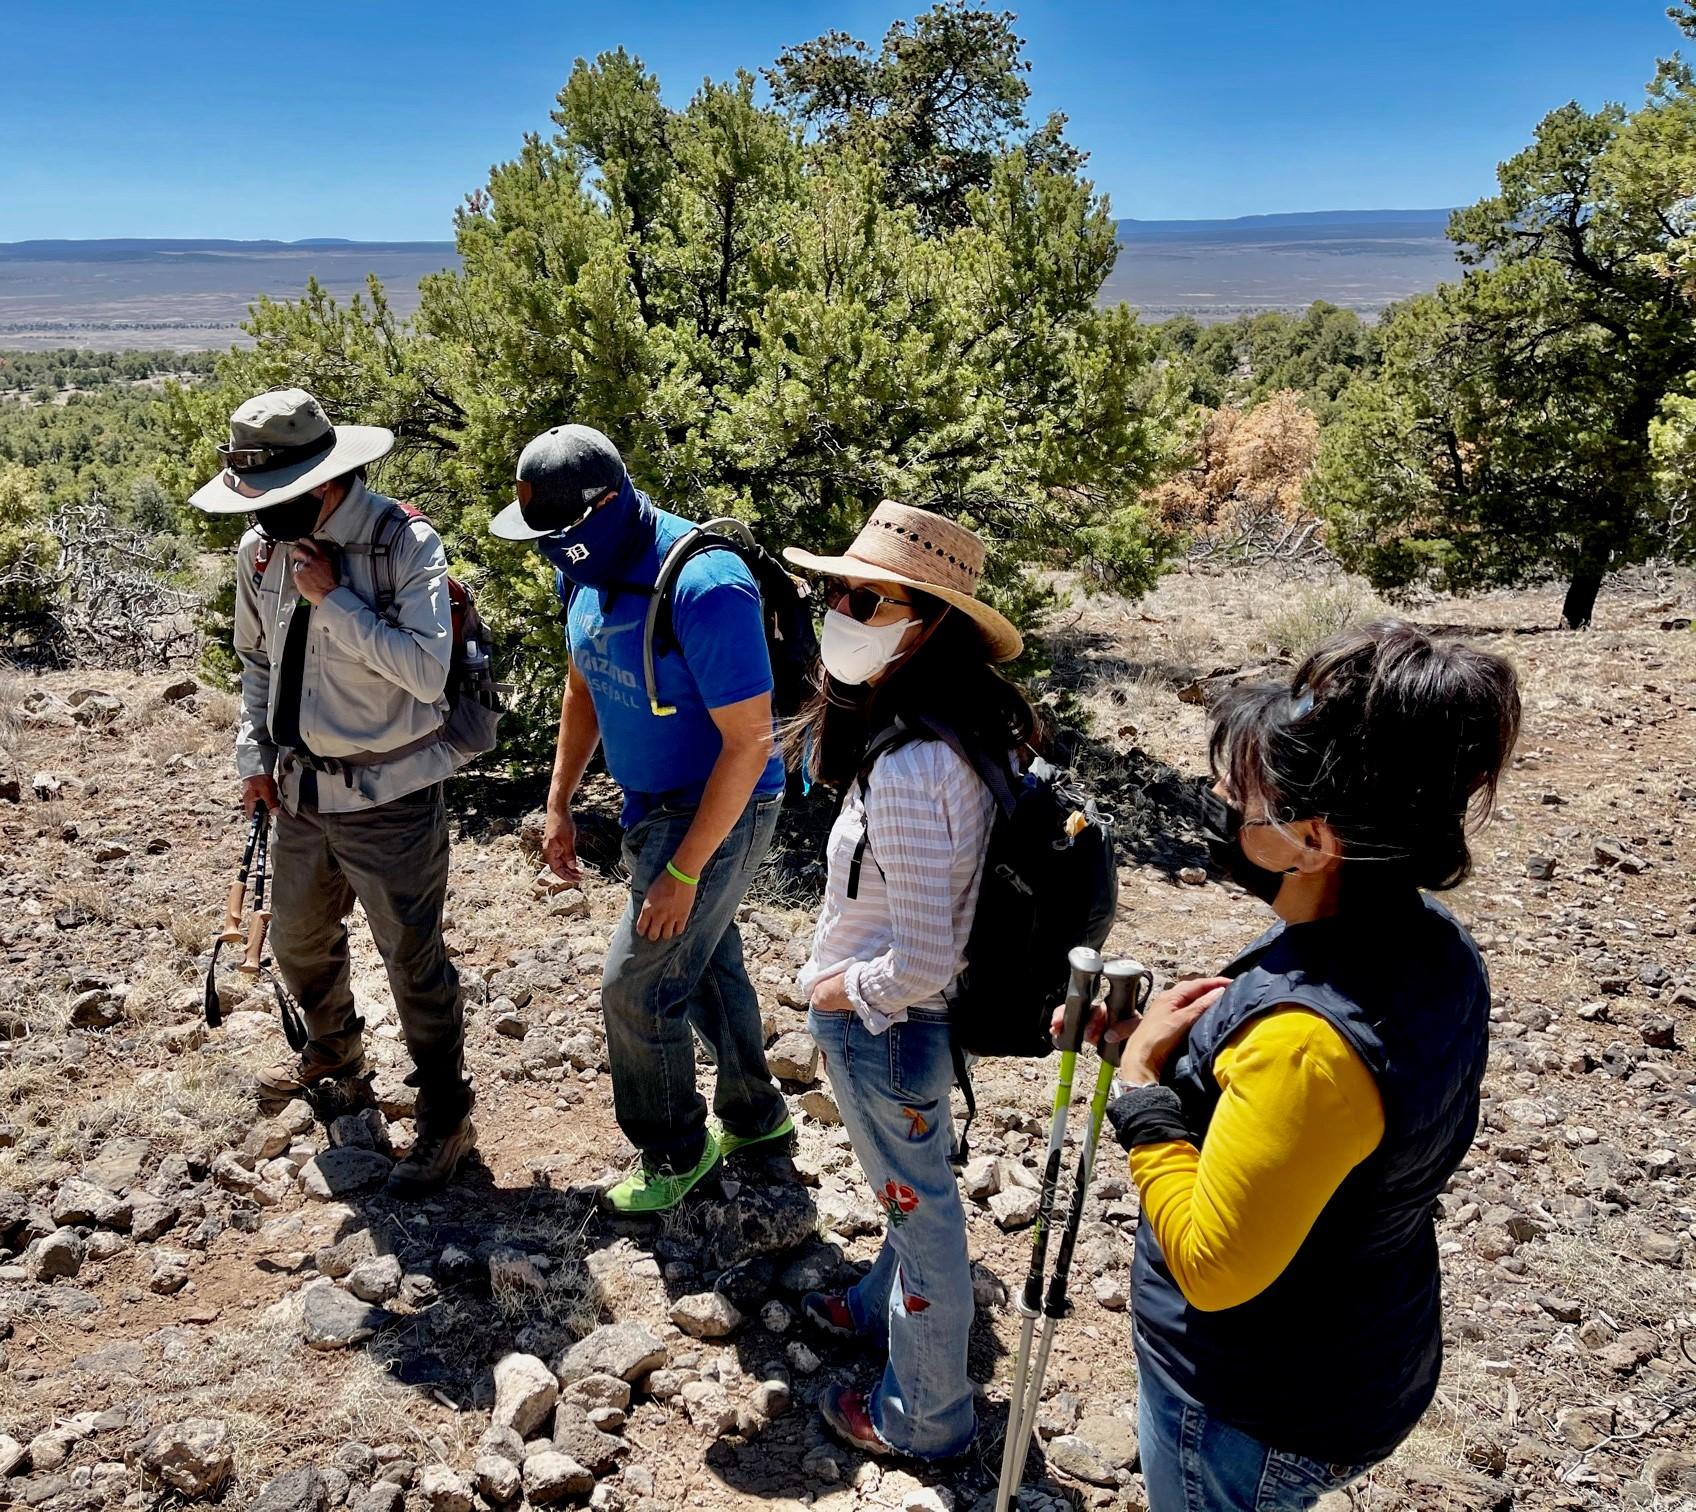 New Mexico Wild celebrates reintroduction of bill to establish Cerro de la Olla Wilderness by Rep. Leger Fernandez